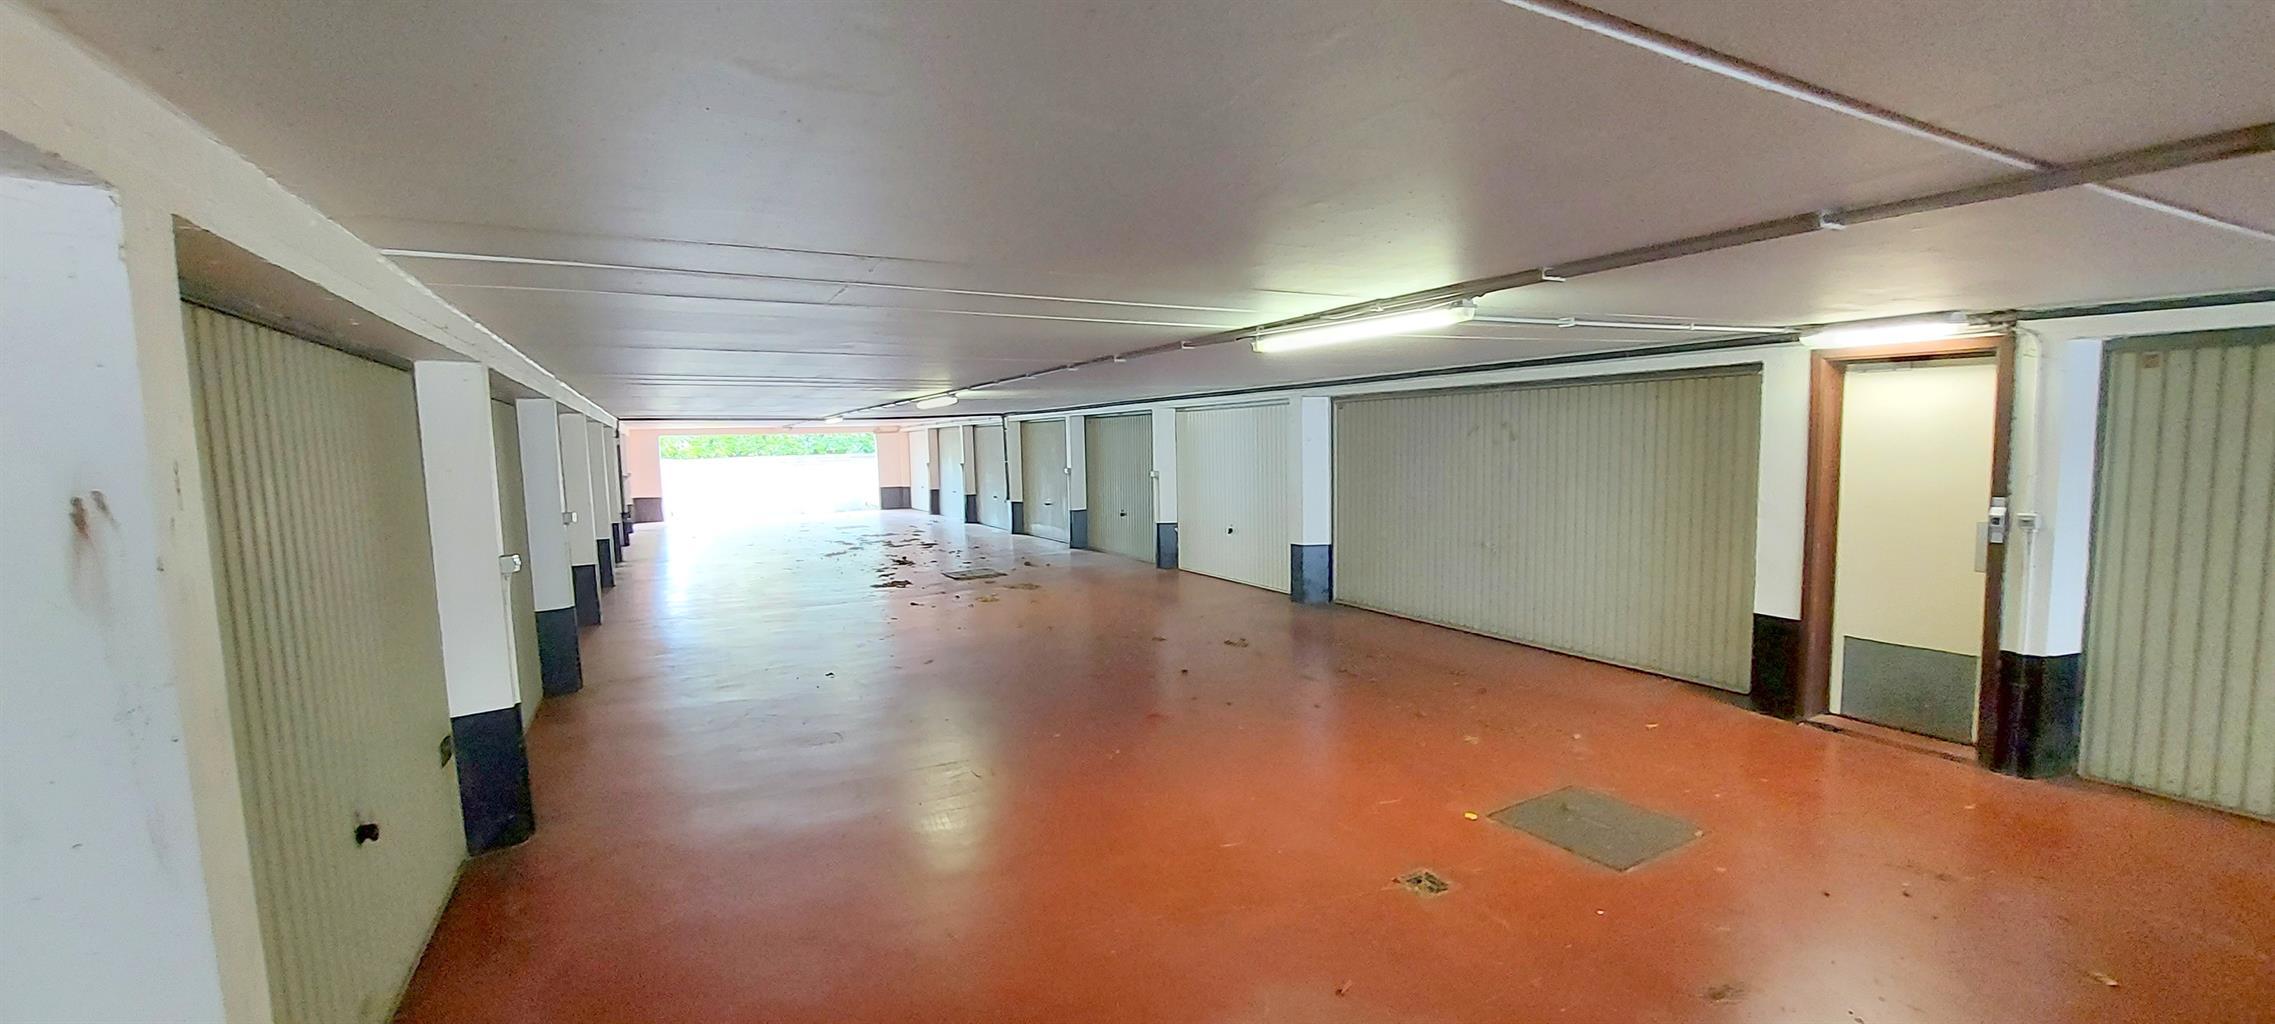 Studio - Woluwe-Saint-Lambert - #4432852-23